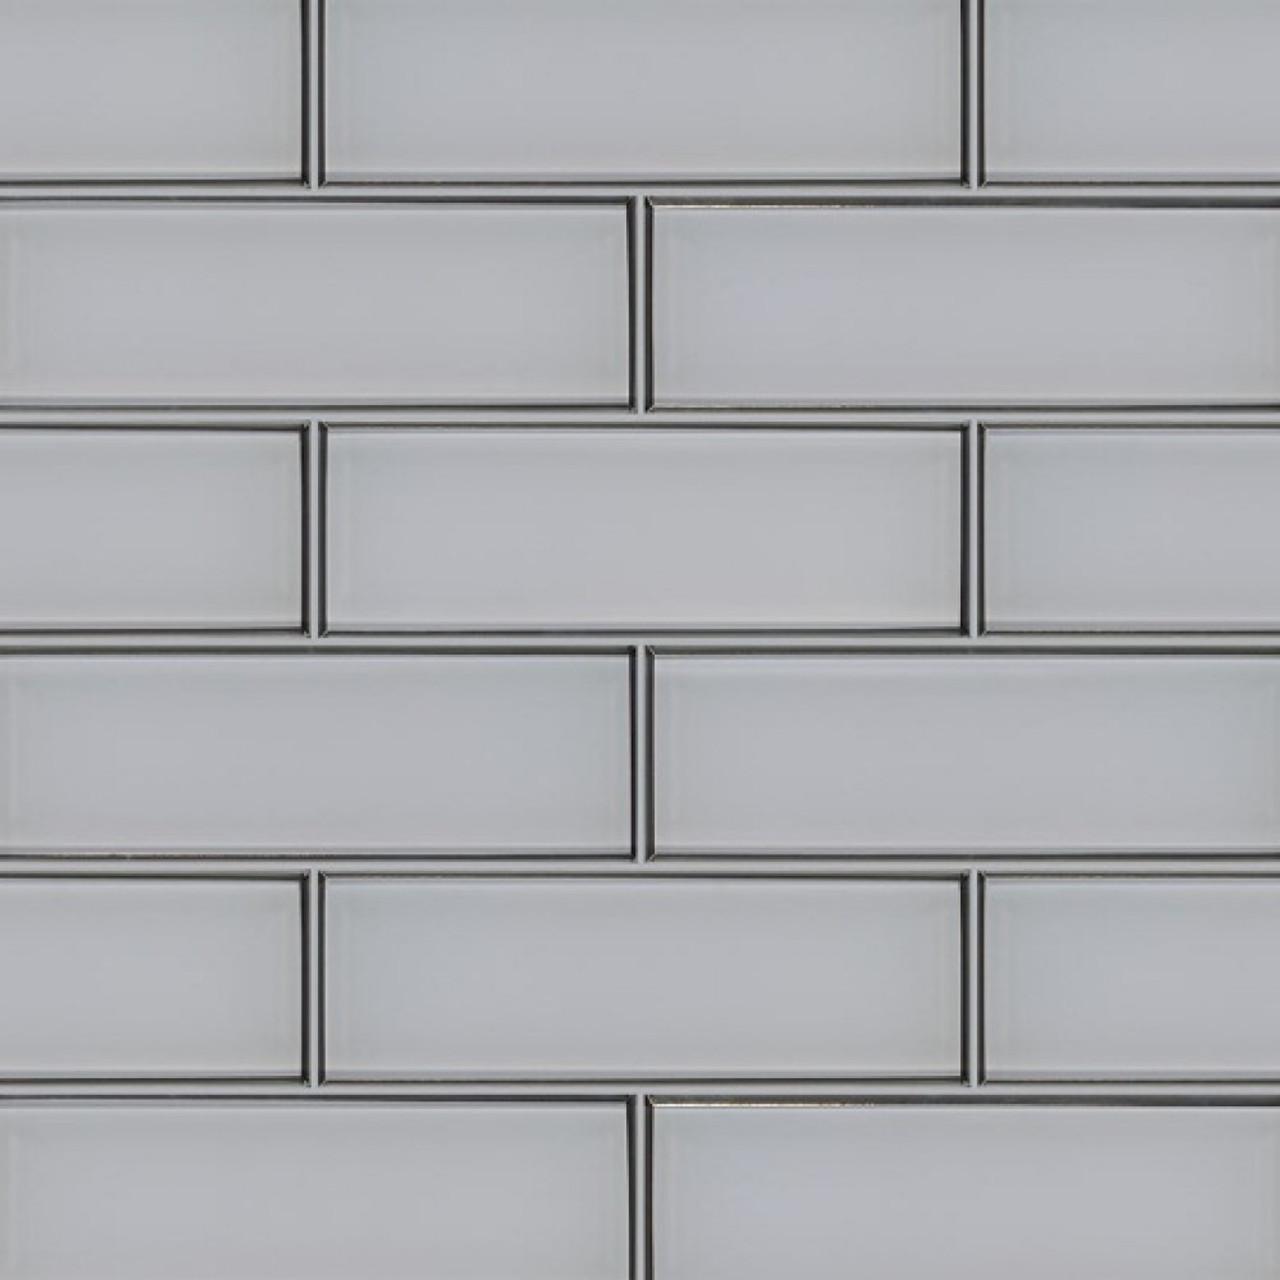 ms international backsplash series ice bevel 4x12 glossy glass subway tile smot gl t icebe412